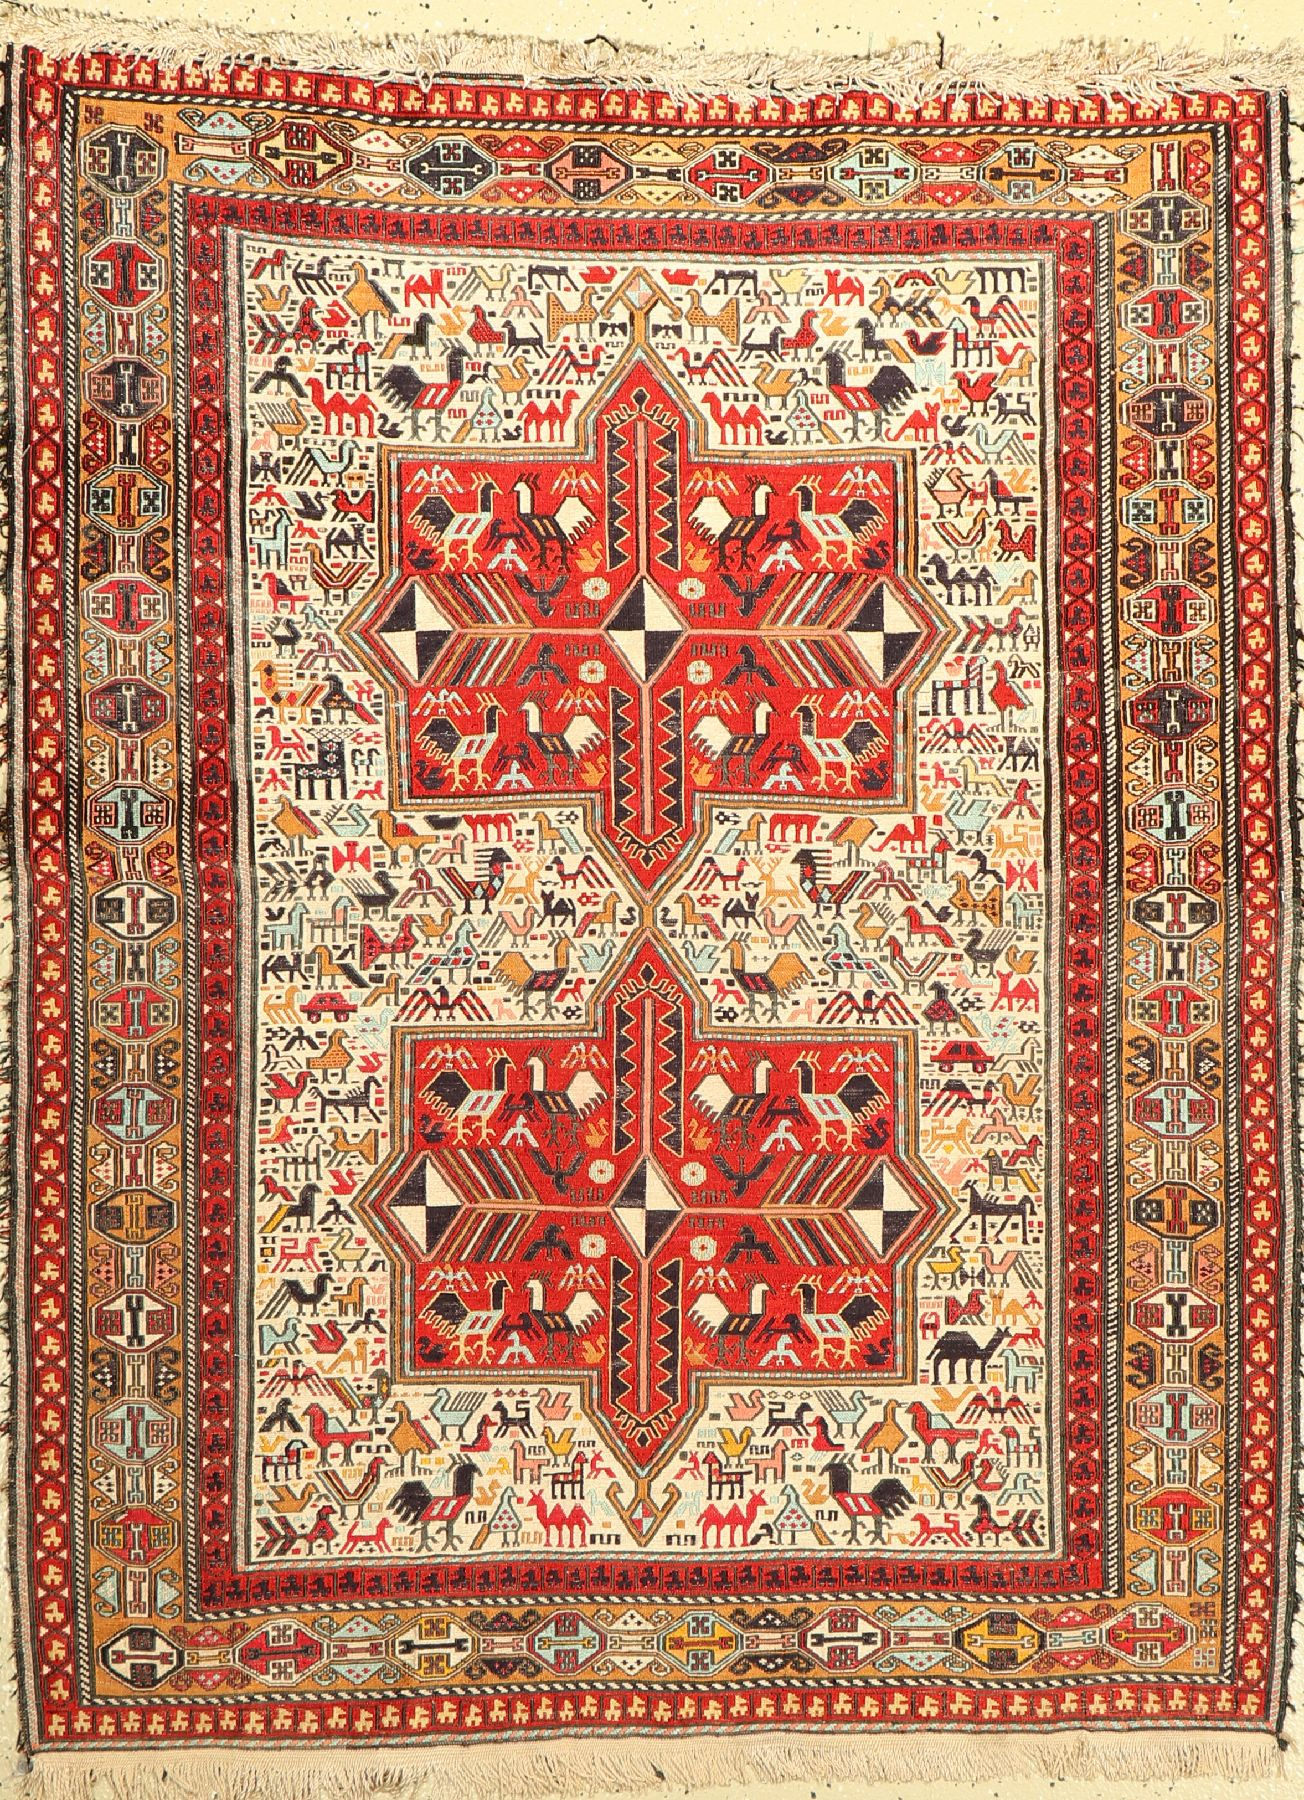 Azeri Sumakh, Azerbaijan, ca. 40 Jahre, Baumwolle, ca. 143 x 110 cm, EHZ: 2-3